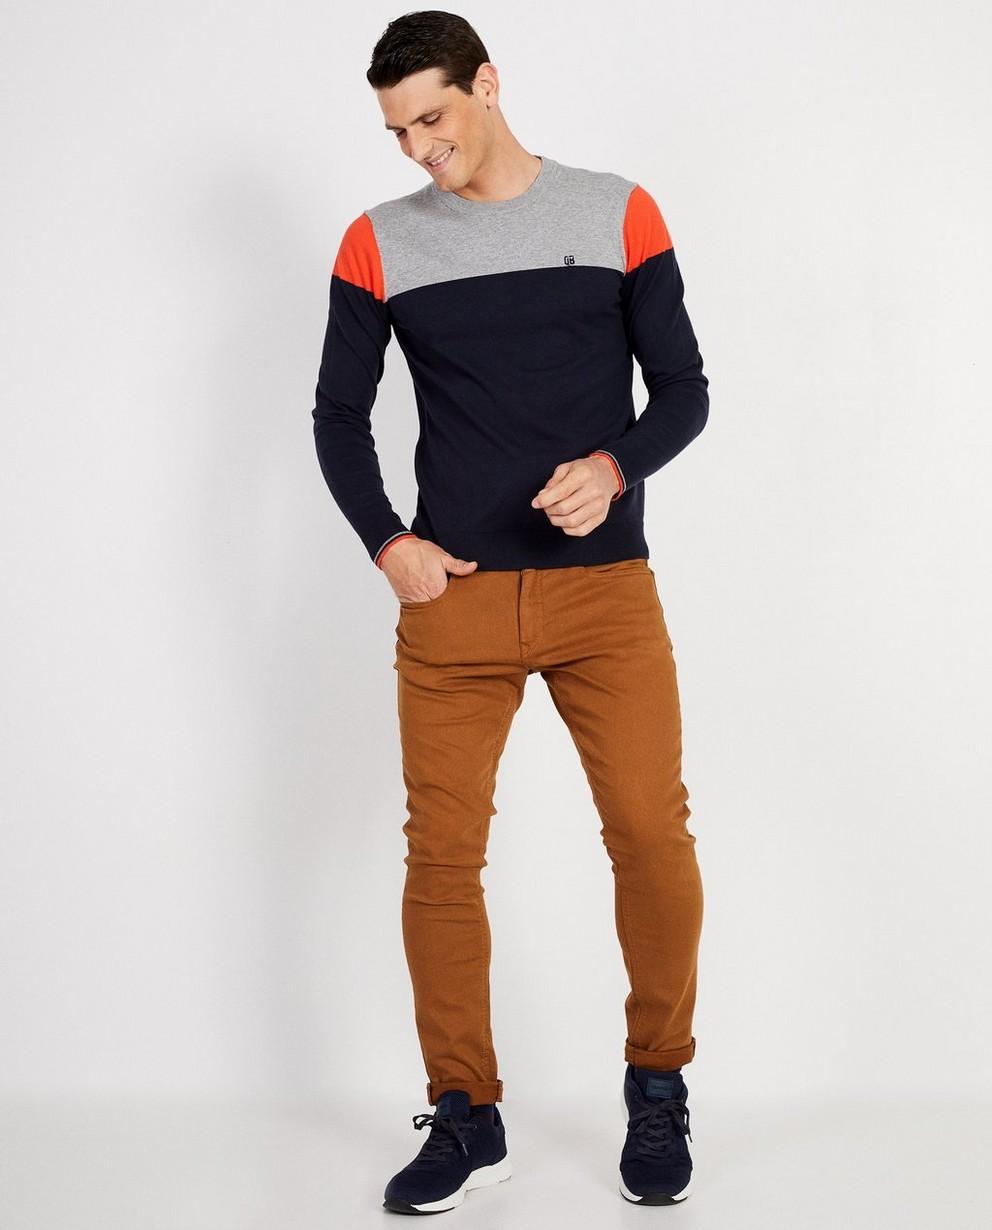 Blauwe skinny JIMMY - verschillende kleuren - JBC NL